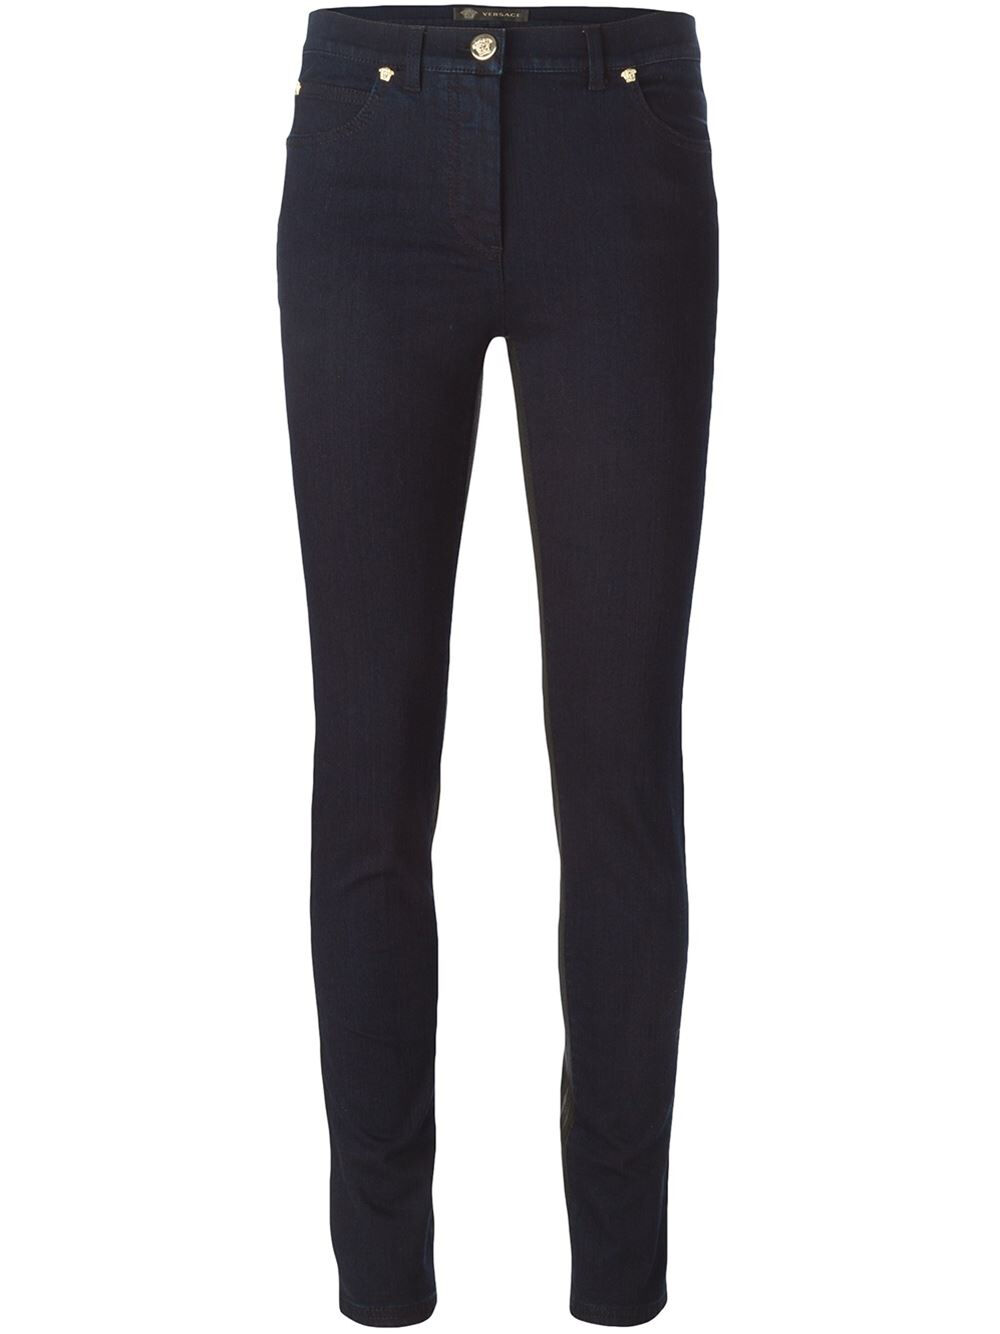 almost famous black soft stretchy stylish black pants juniors sizes 0 1